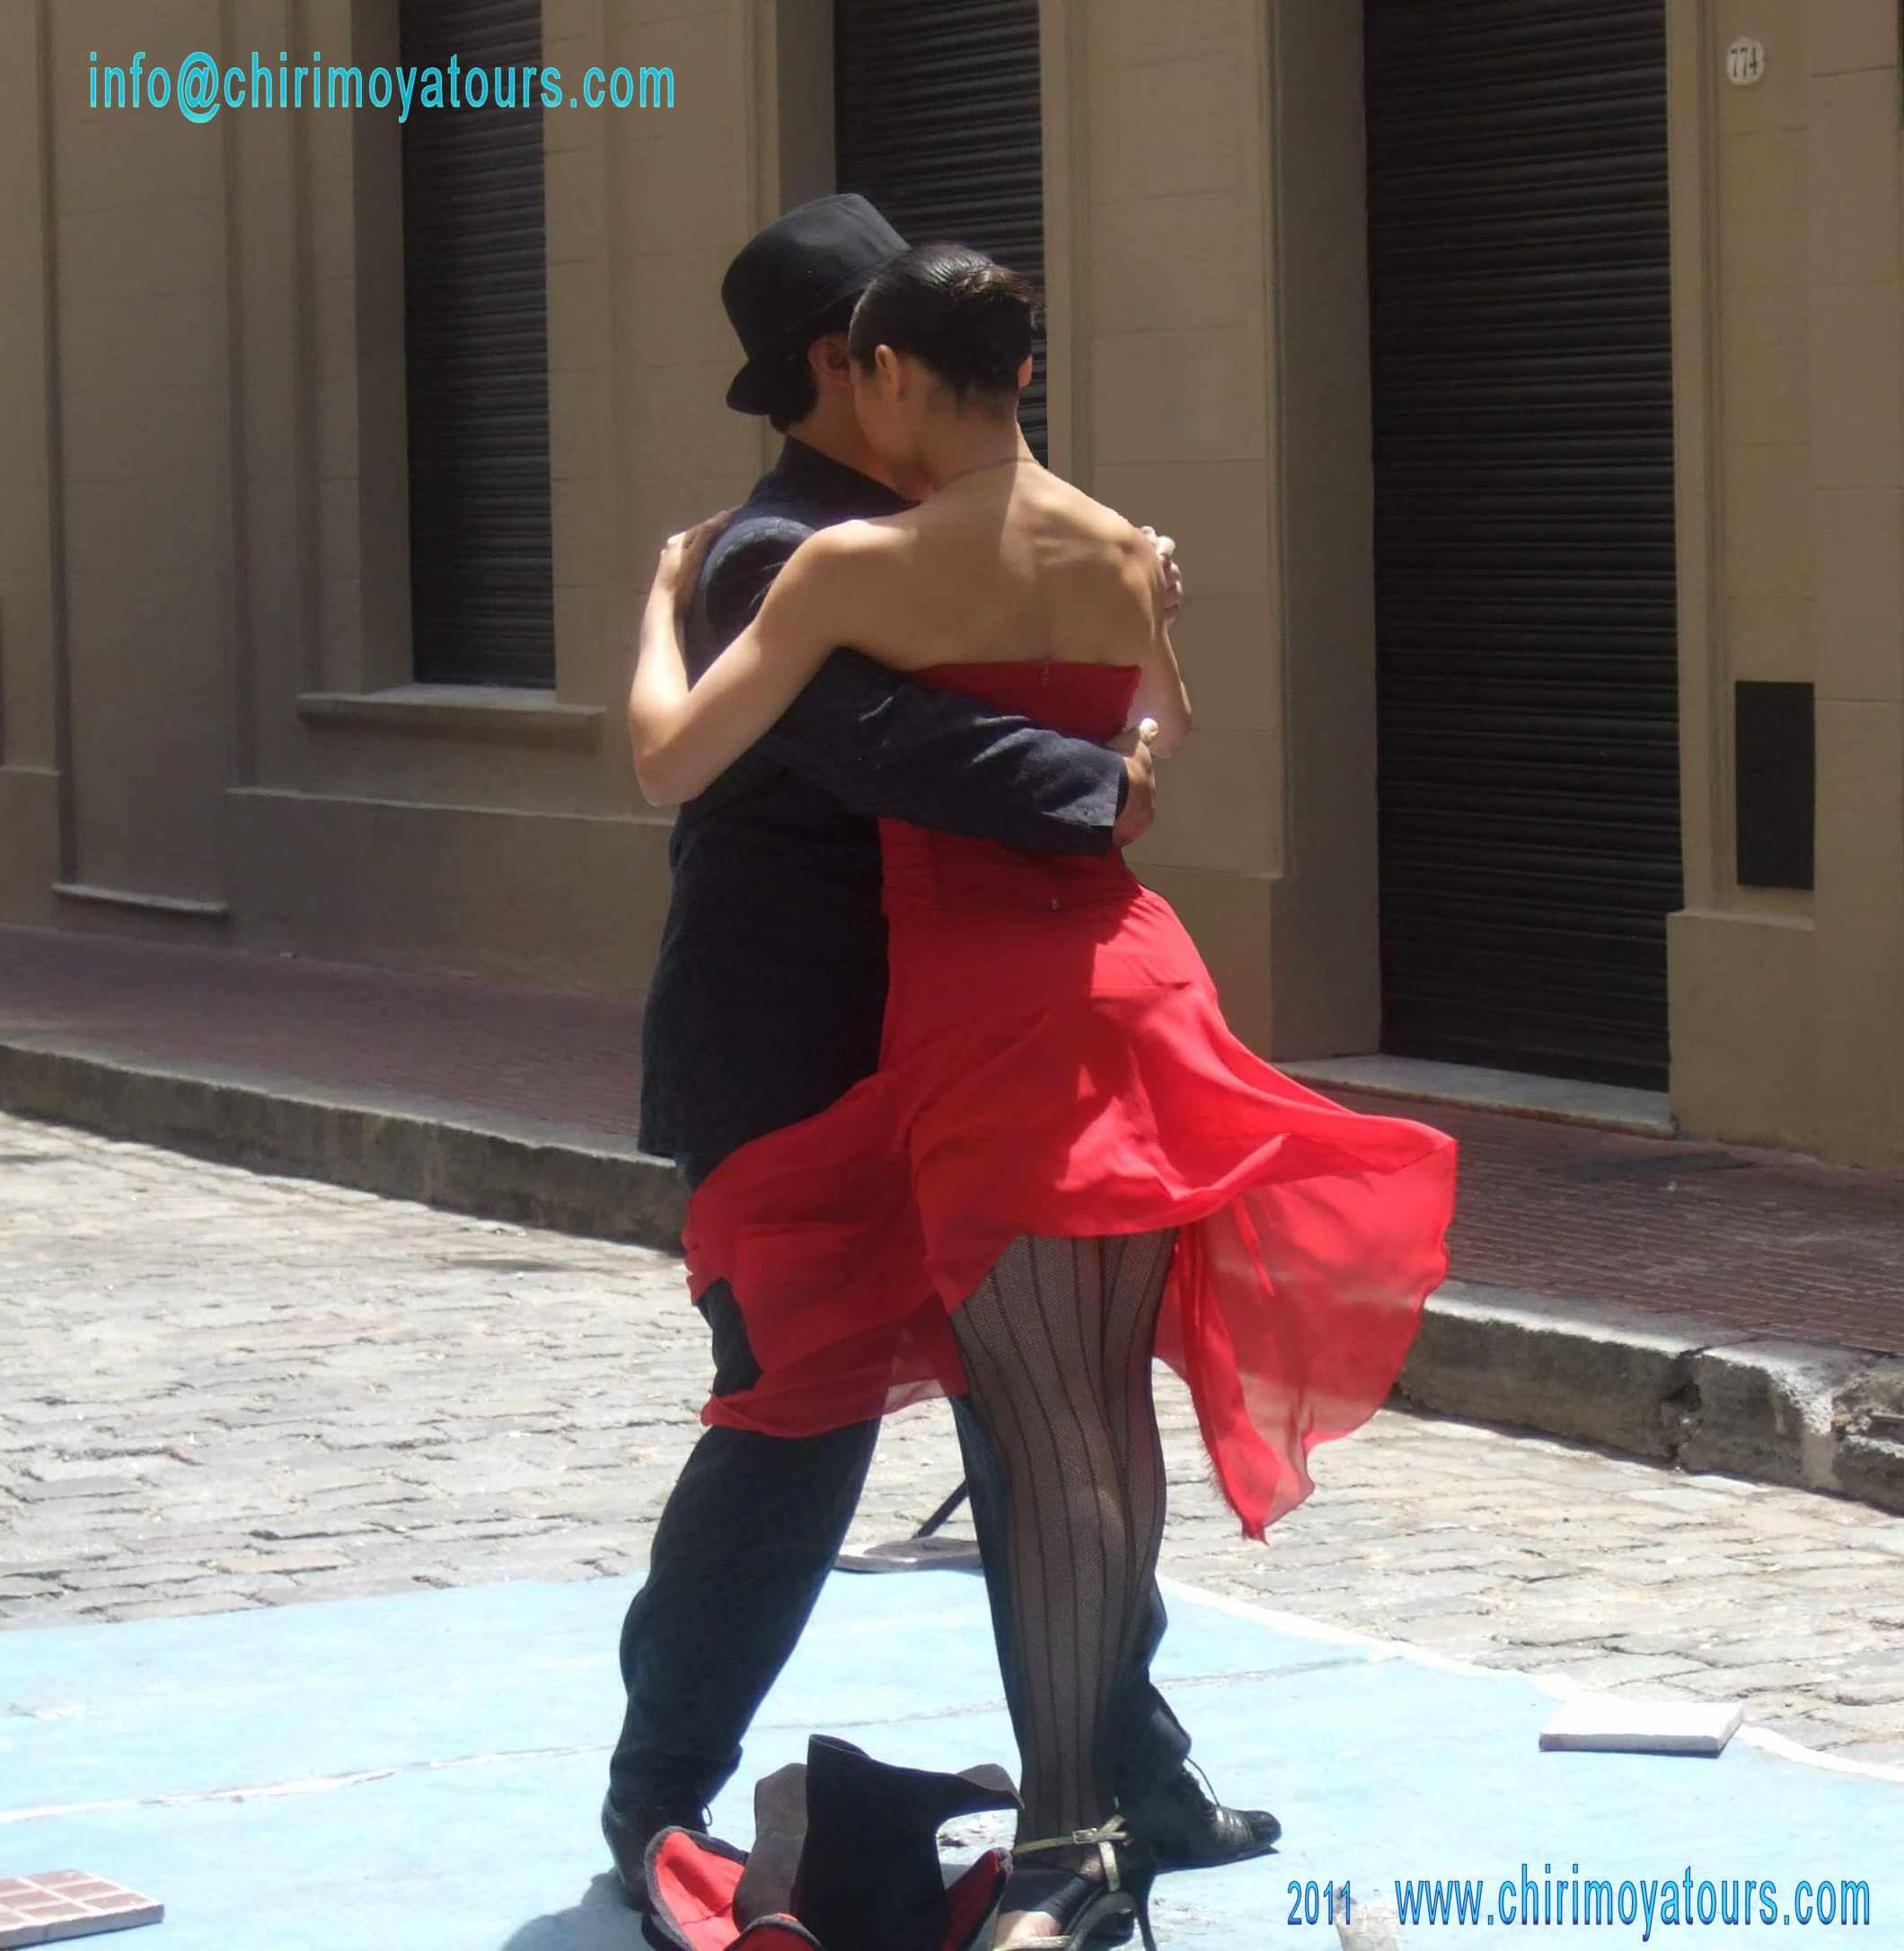 Tango Tänzer Buenos Aires